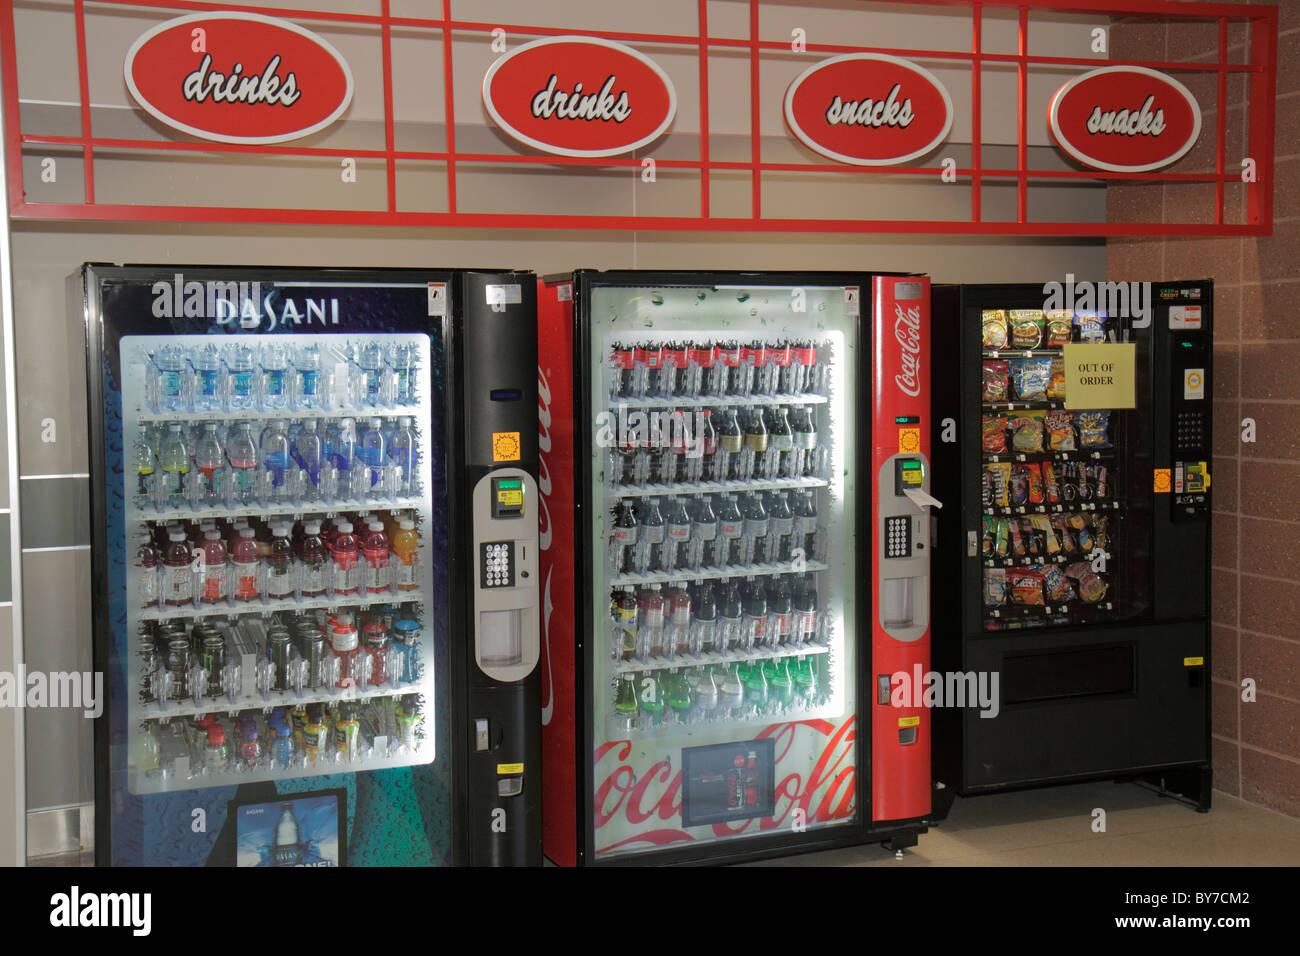 Georgia Hartsfield-Jackson Atlanta International Airport ATL vending machine soft drink Coca Cola Dasani water soda - Stock Image